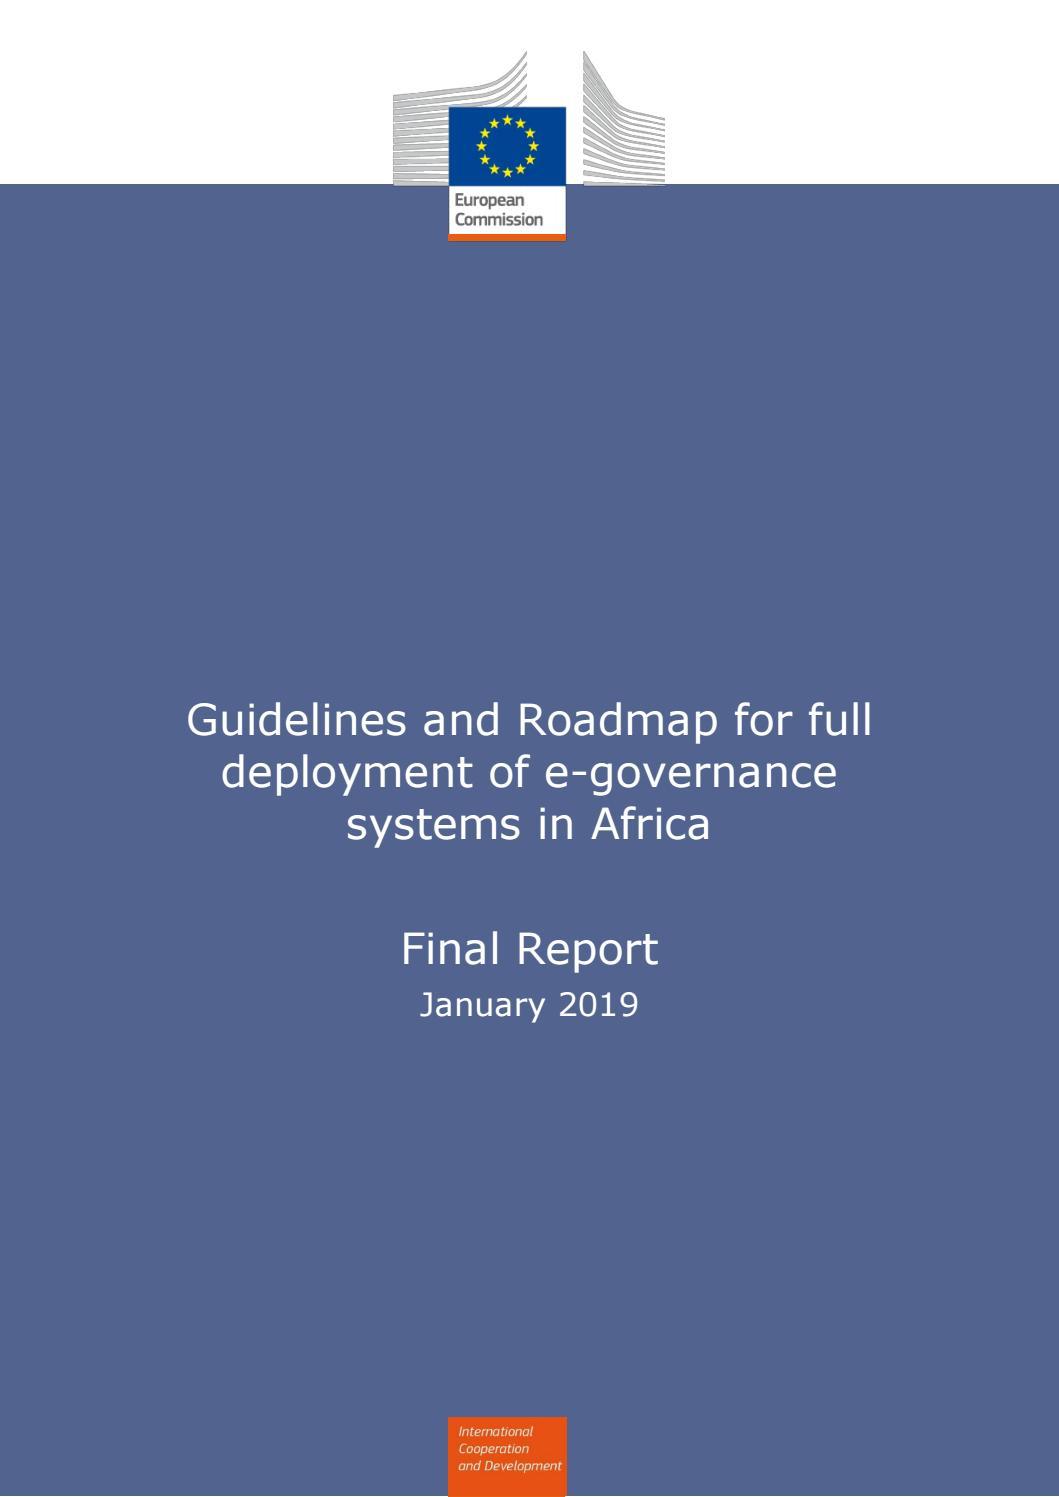 Guidelines and Roadmap for full deployment of e-governance